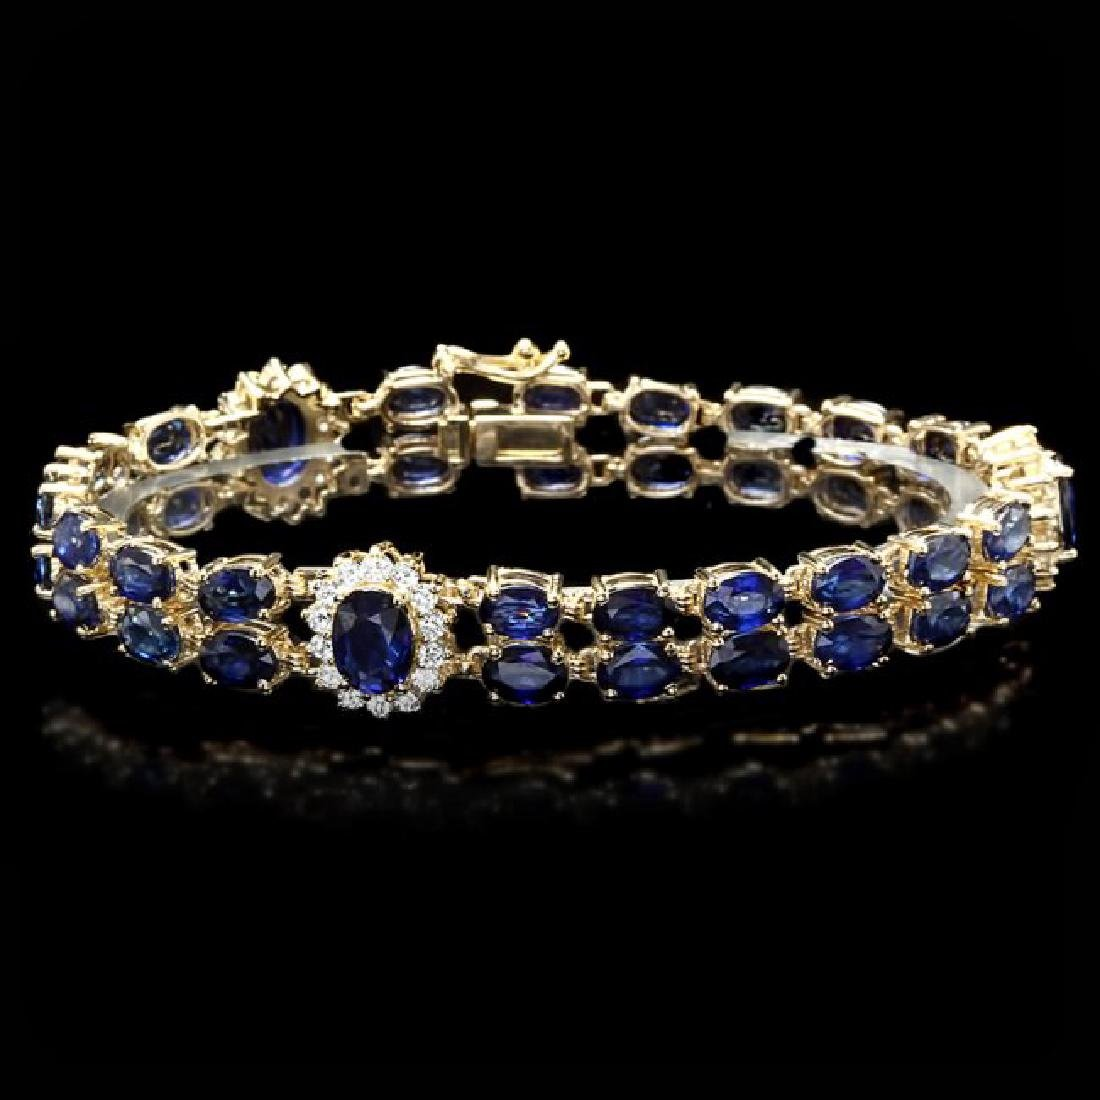 14k Gold 22ct Sapphire 1.50ct Diamond Bracelet - 2